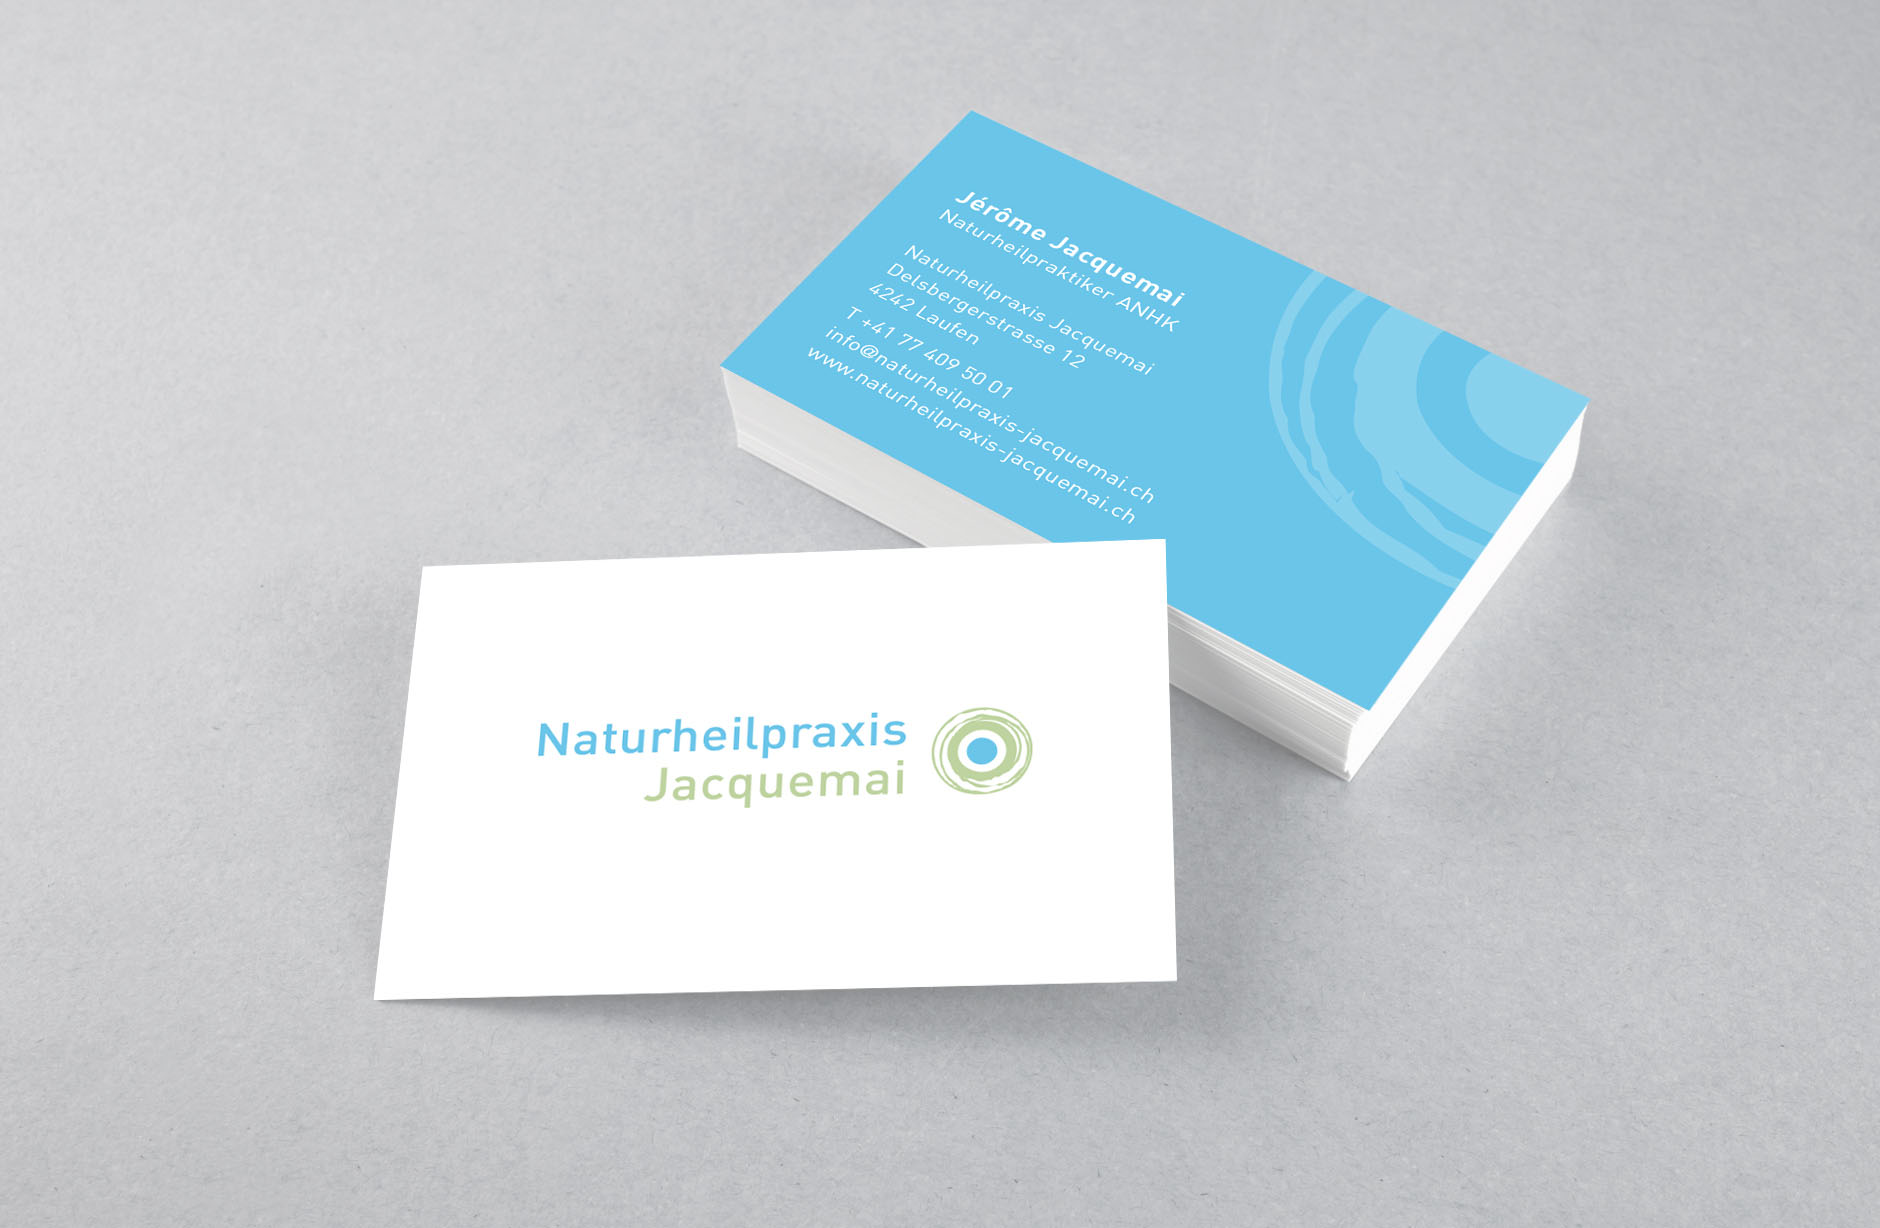 Naturheilpraxis Jacquemai Visitenkarte